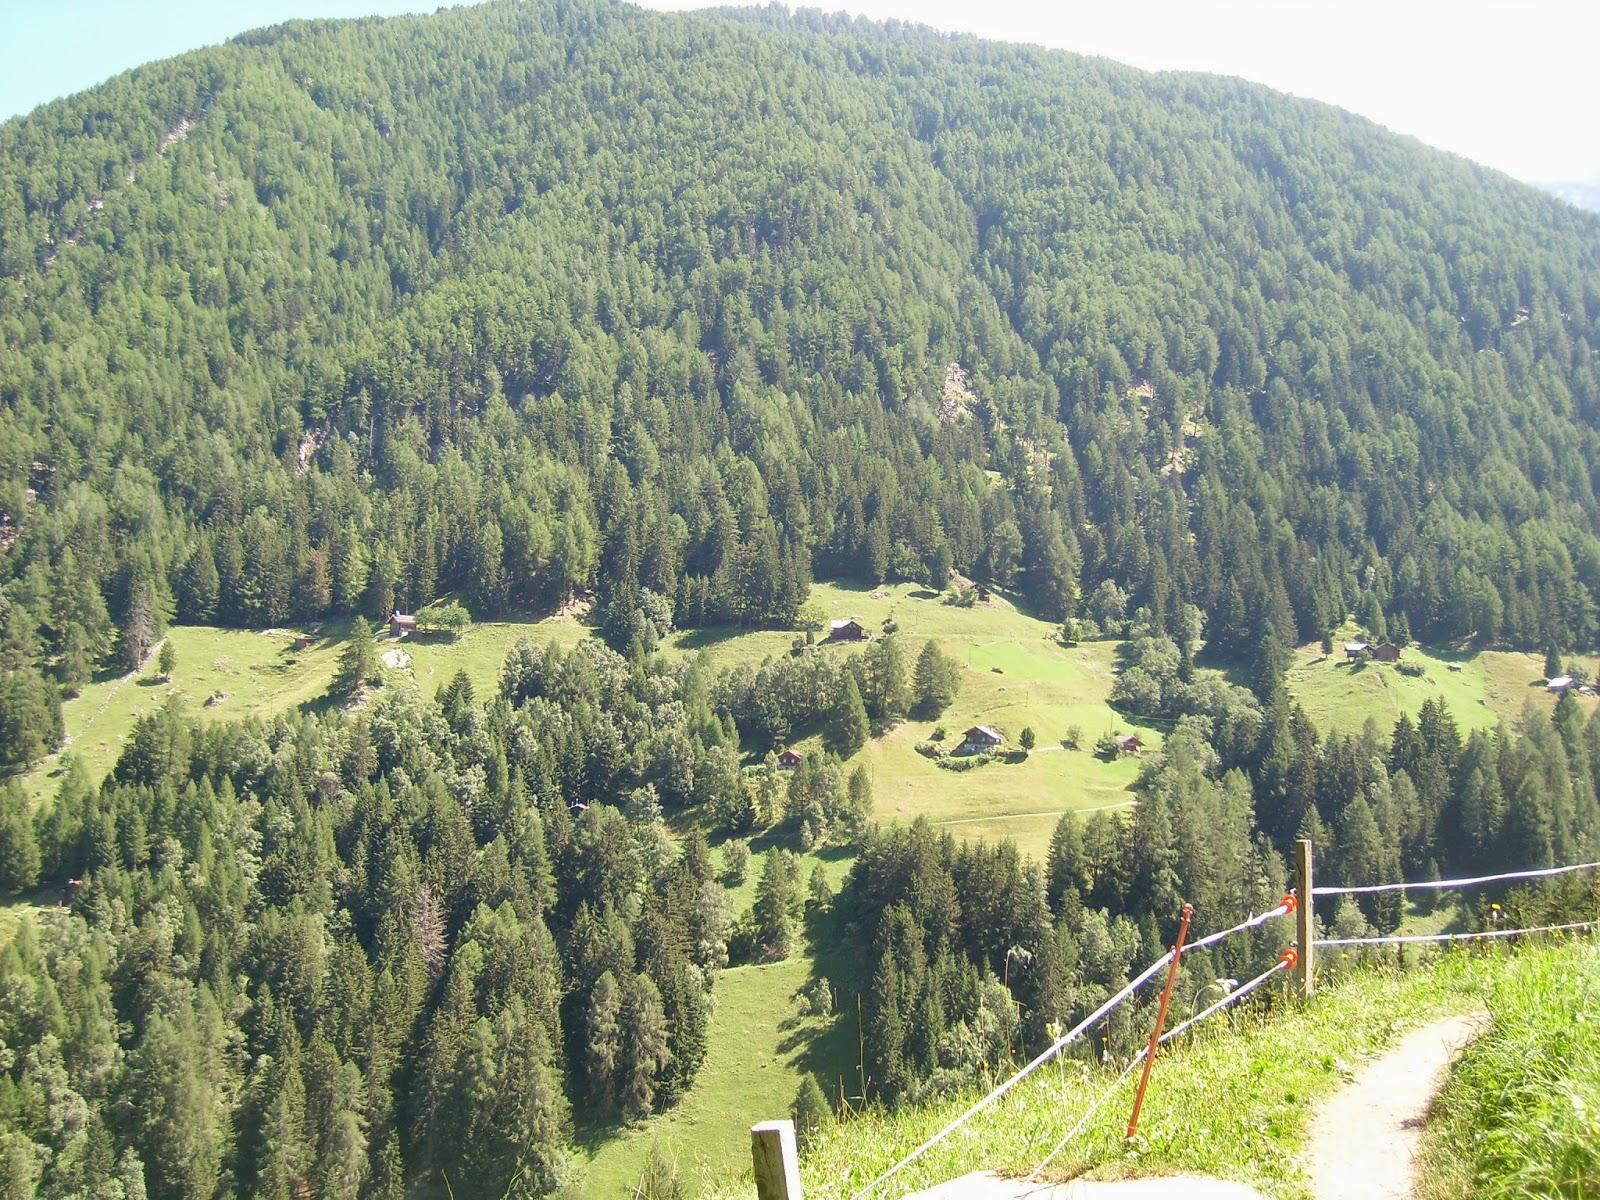 E o verão 2014 na Suíça?